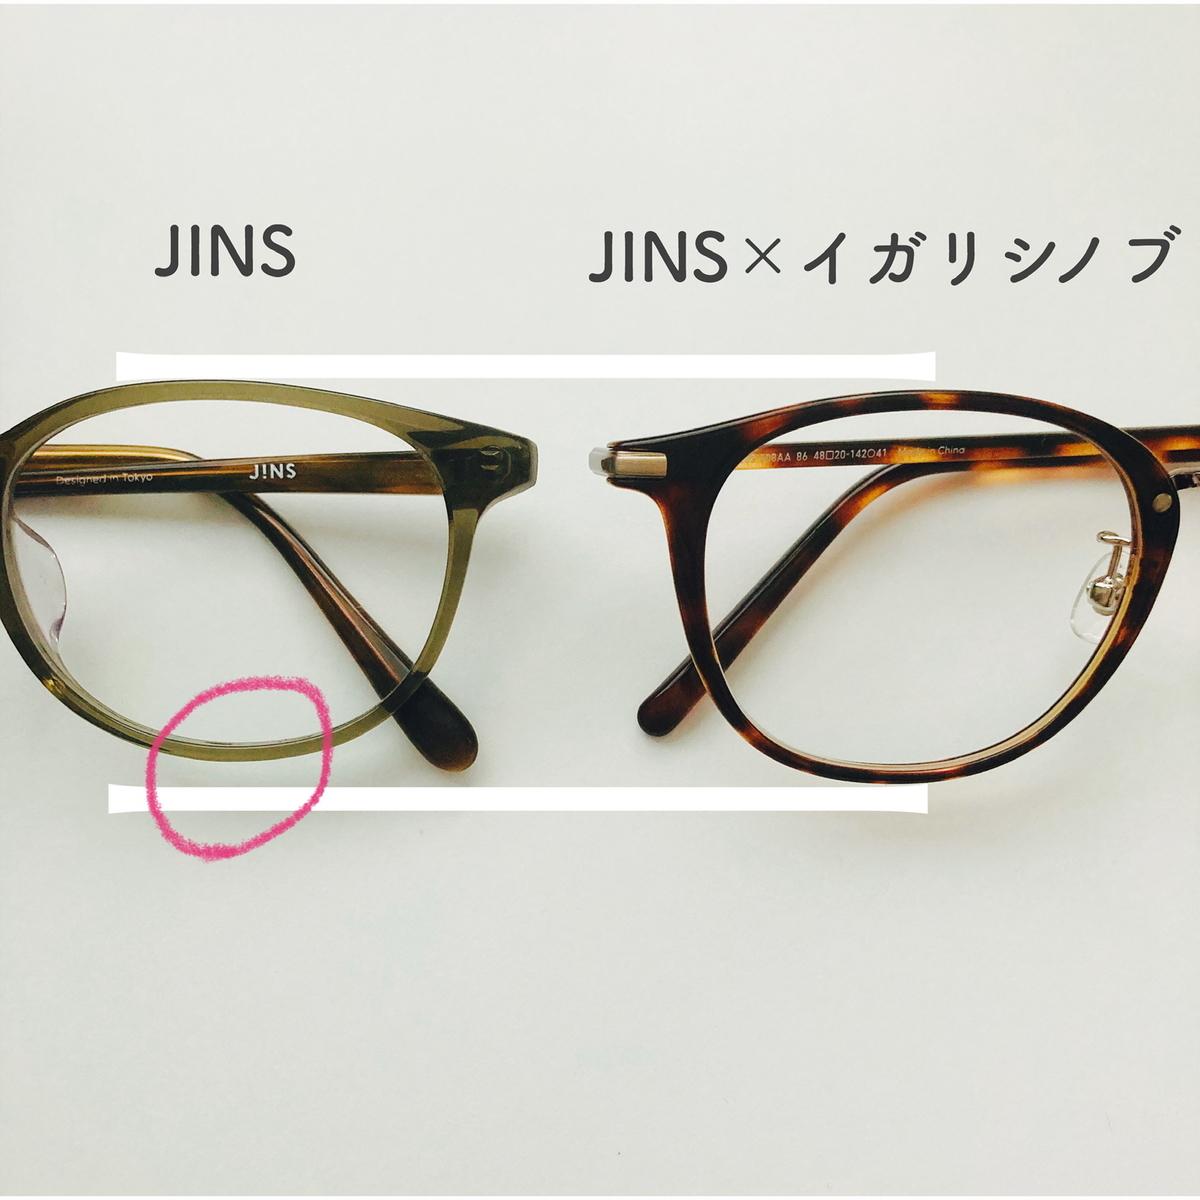 JINS×イガリシノブ  美人見えメガネ 大きさ比較